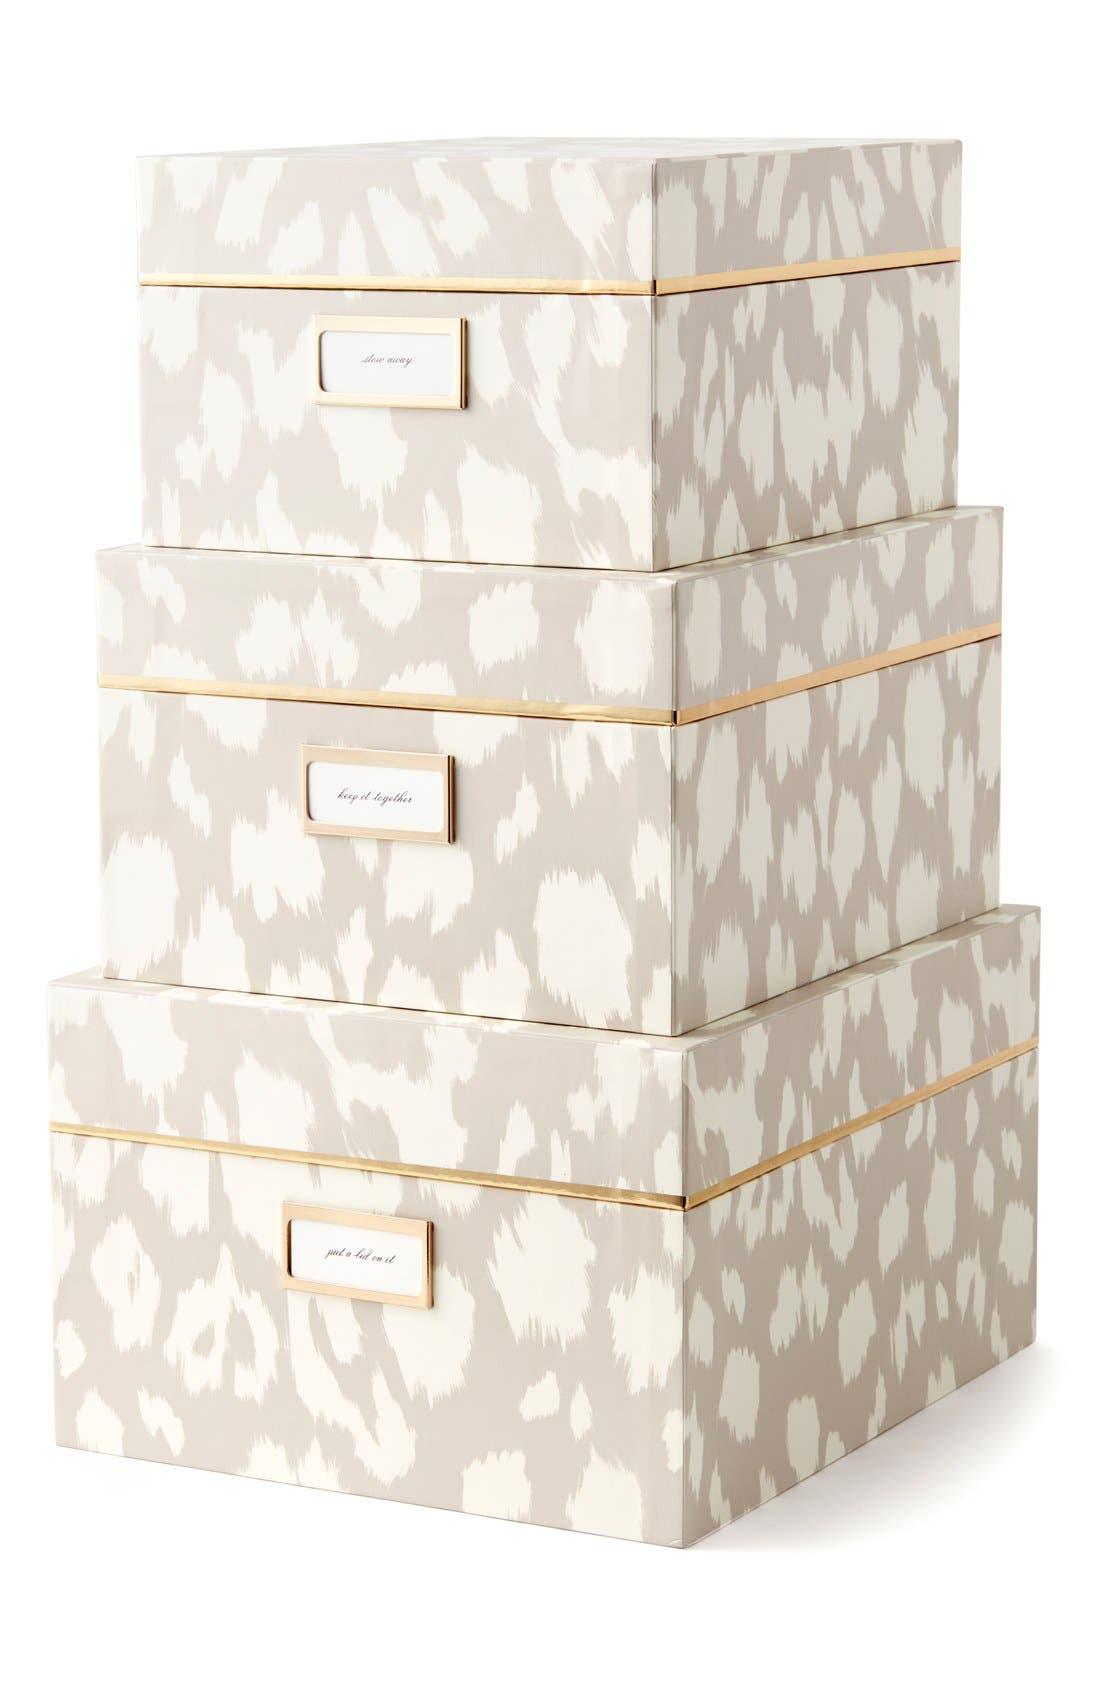 Alternate Image 1 Selected - kate spade new york storage nesting boxes (set of 3)